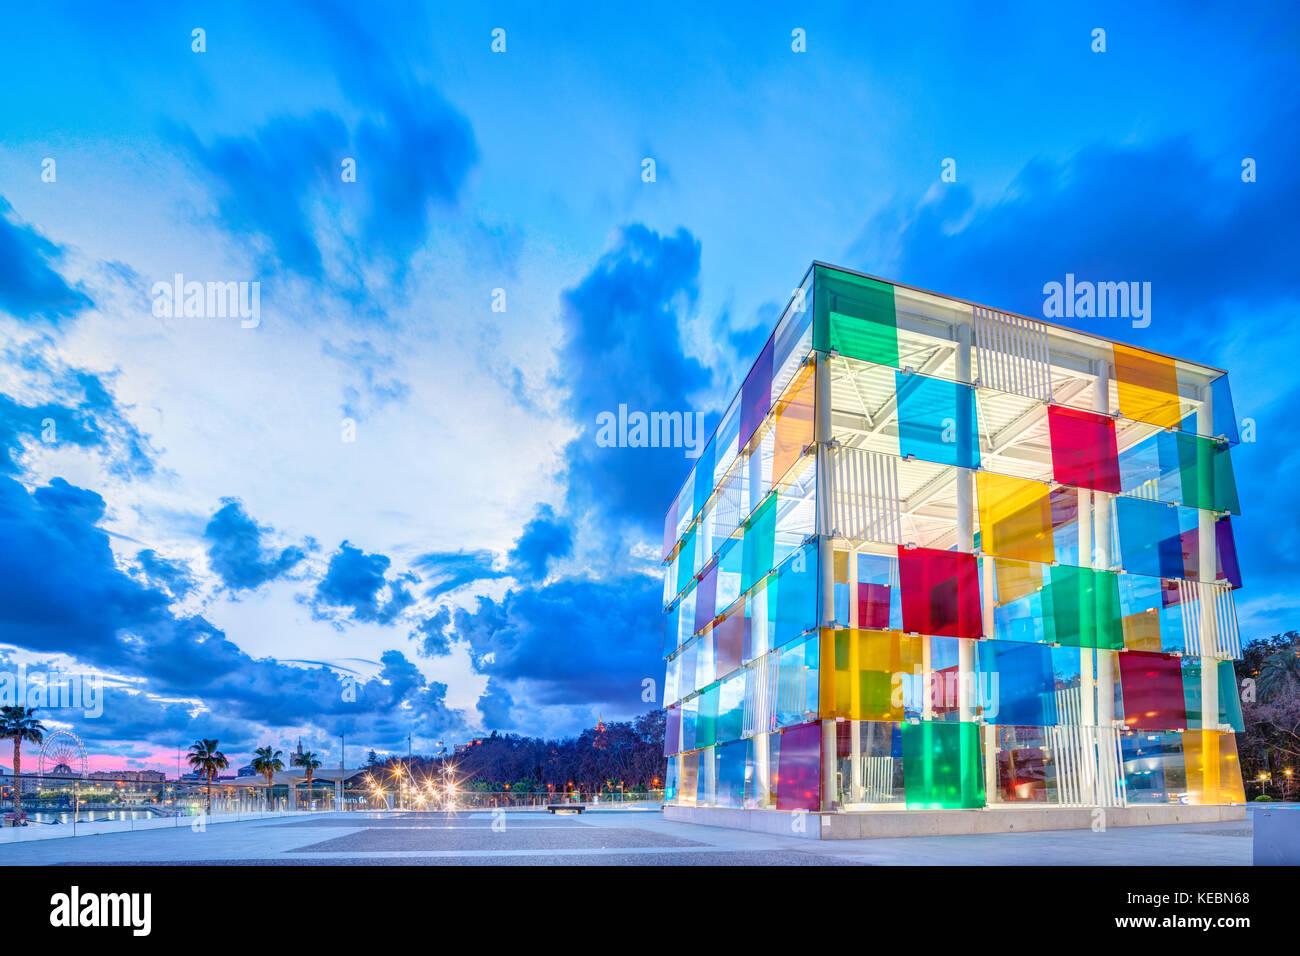 https://c7.alamy.com/comp/KEBN68/malaga-centre-pompidou-malaga-pompidou-museum-malaga-malaga-pompidou-KEBN68.jpg